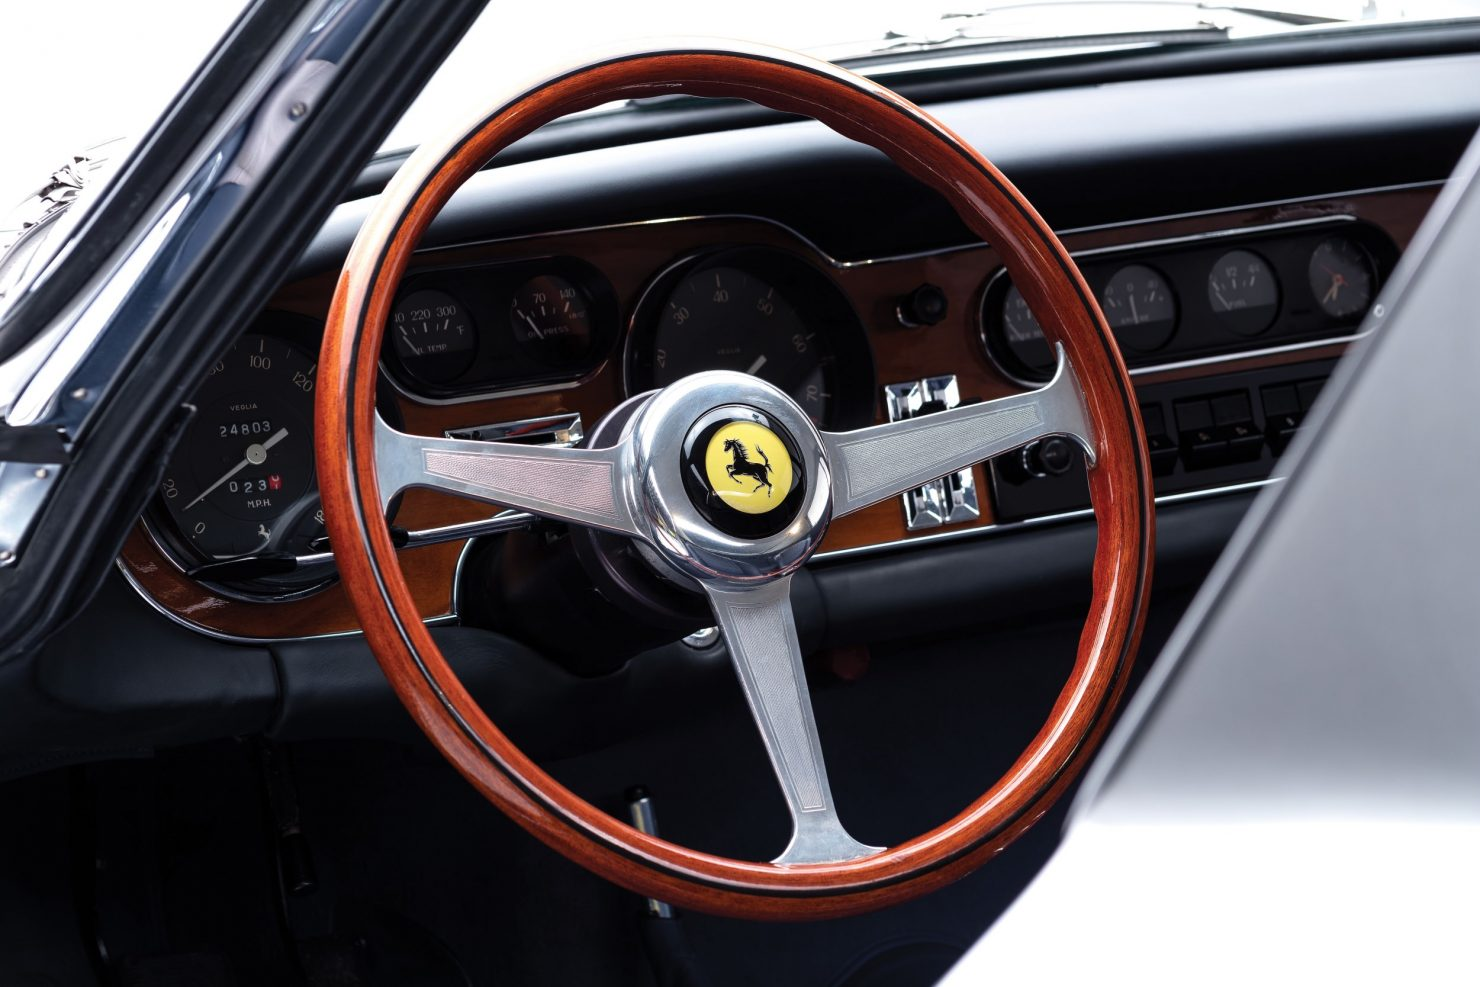 ferrari 275 gtb car 11 1480x987 - 1965 Ferrari 275 GTB/6C Alloy